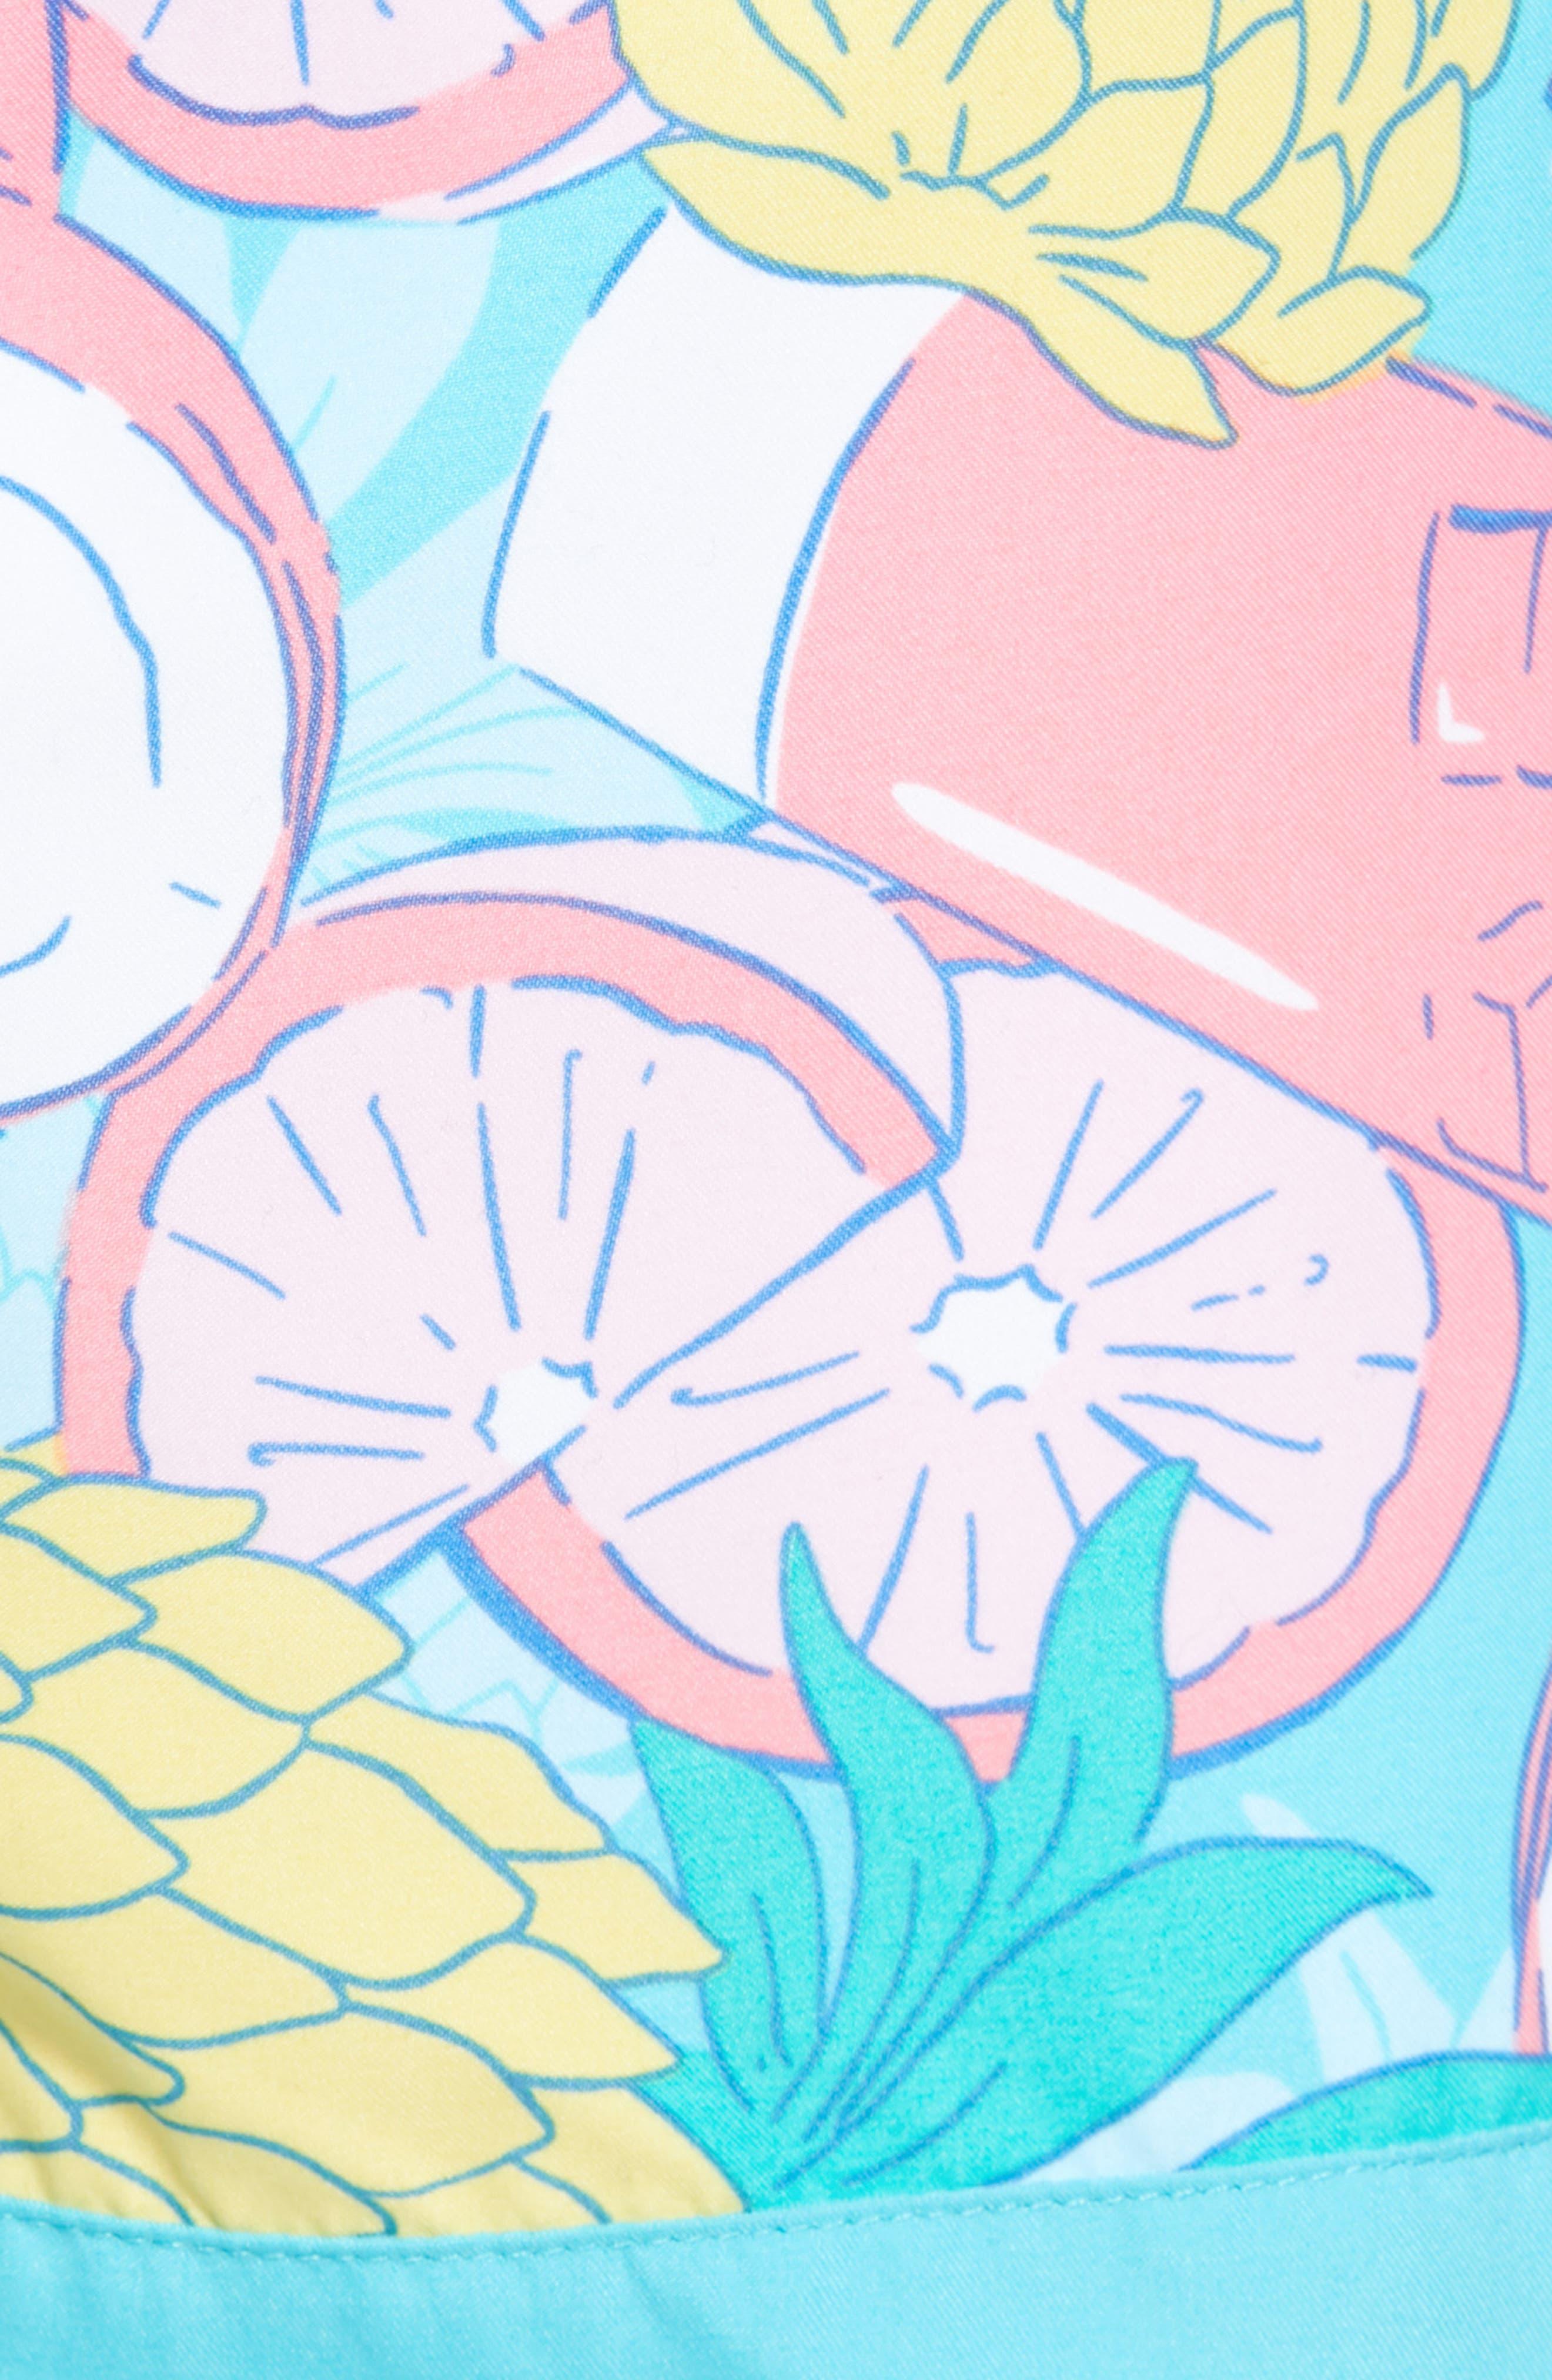 Chappy Pieced Bahama Mama Swim Trunks,                             Alternate thumbnail 5, color,                             Turquoise